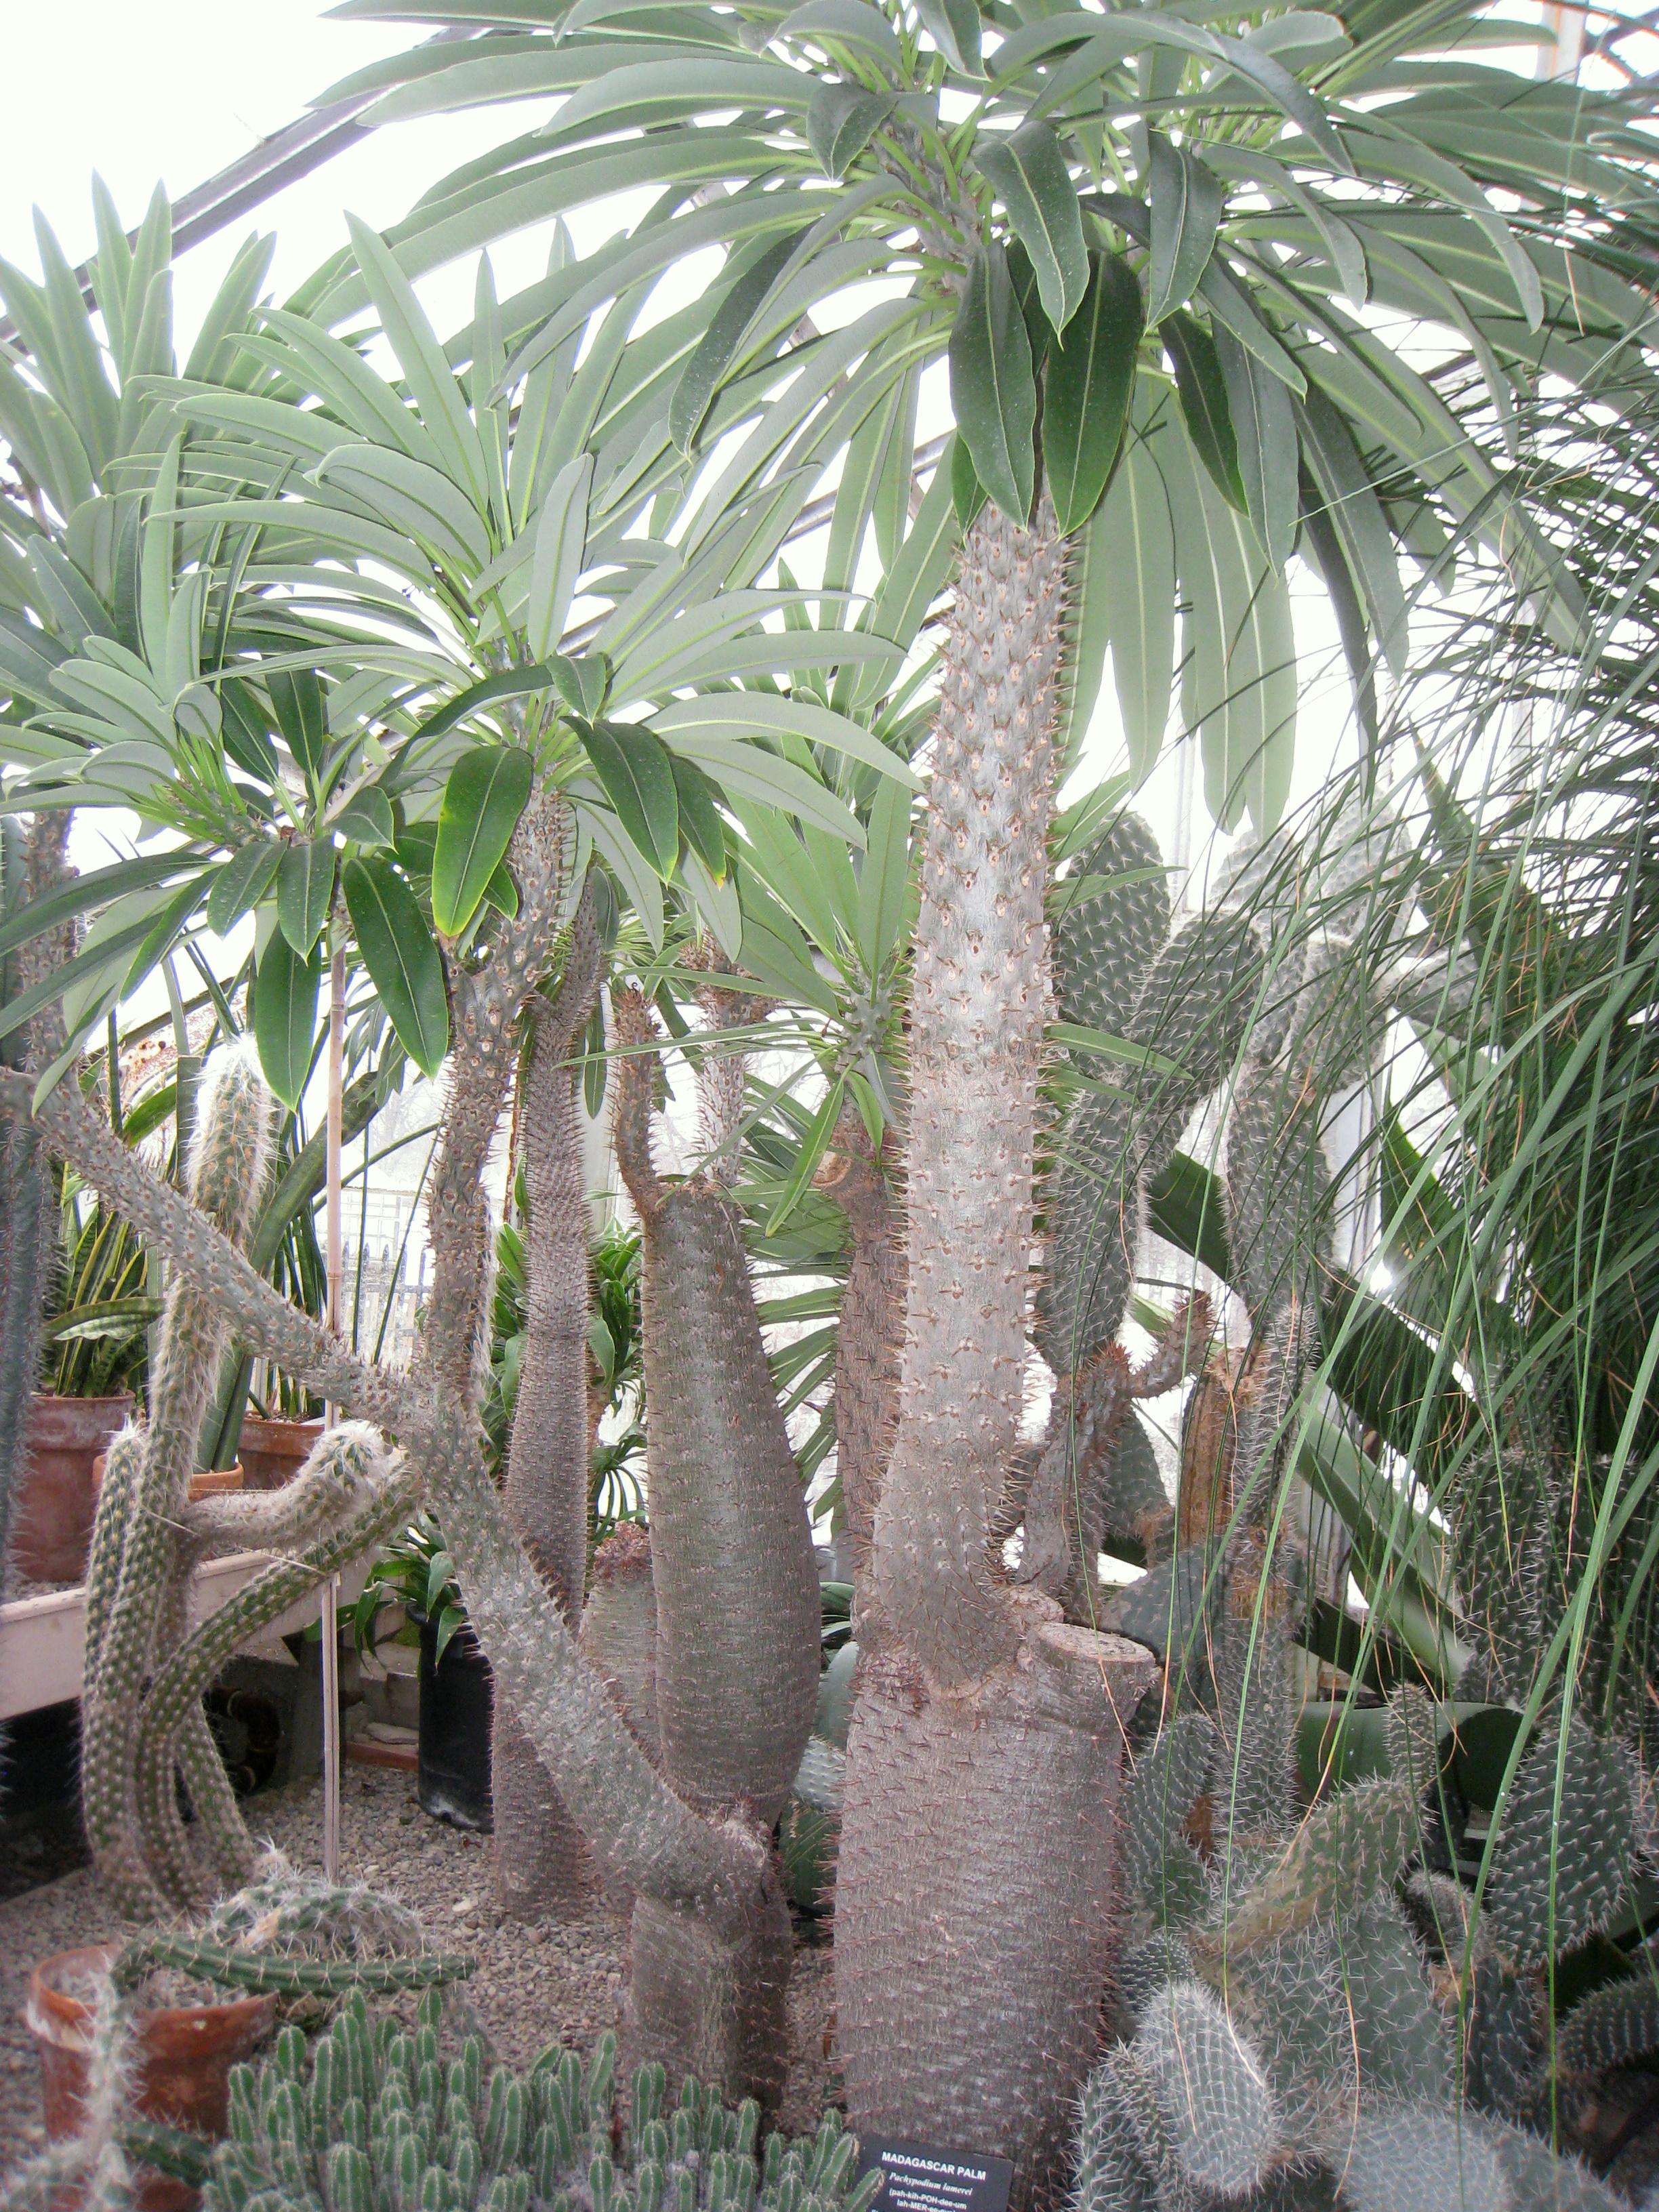 Cyphostemma laza Planta Suculenta de Madagascar enredadera